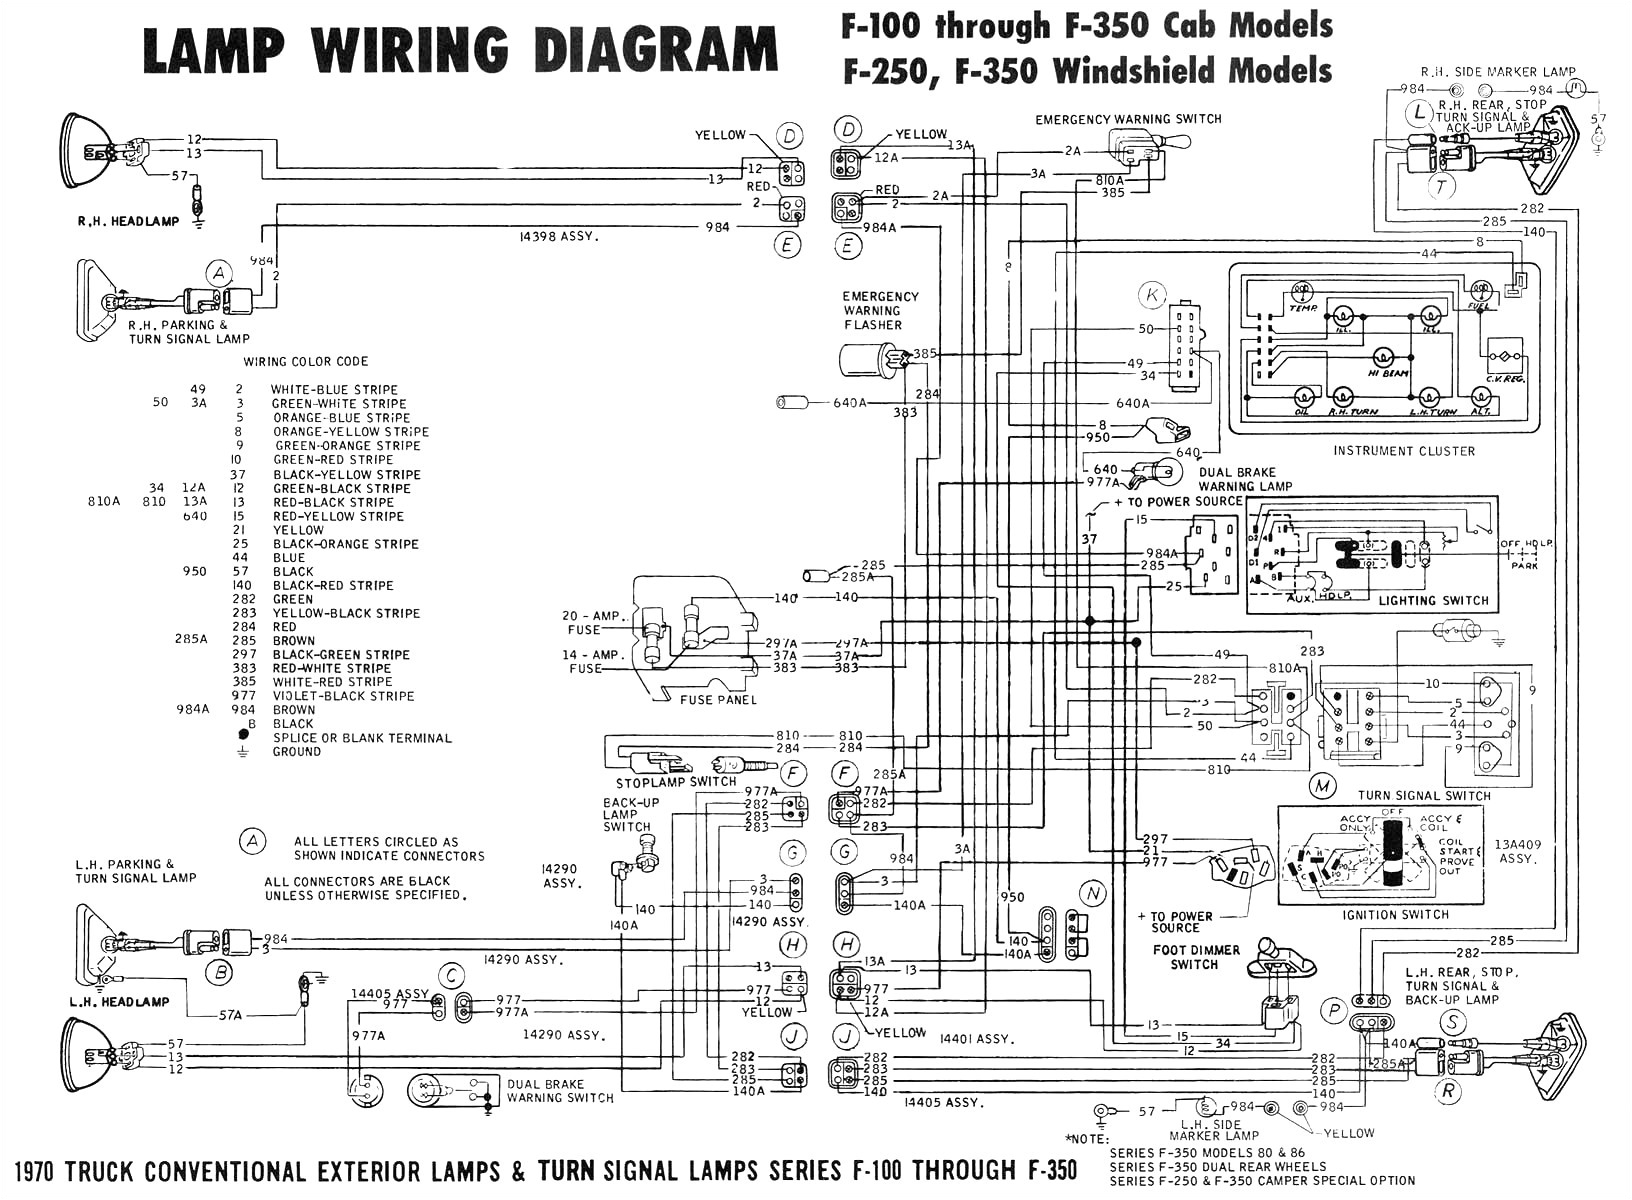 wire harness wir01922 wiring diagram f350 wiring schematics wiring diagram centref350 wiring schematics wiring diagram expertwiring